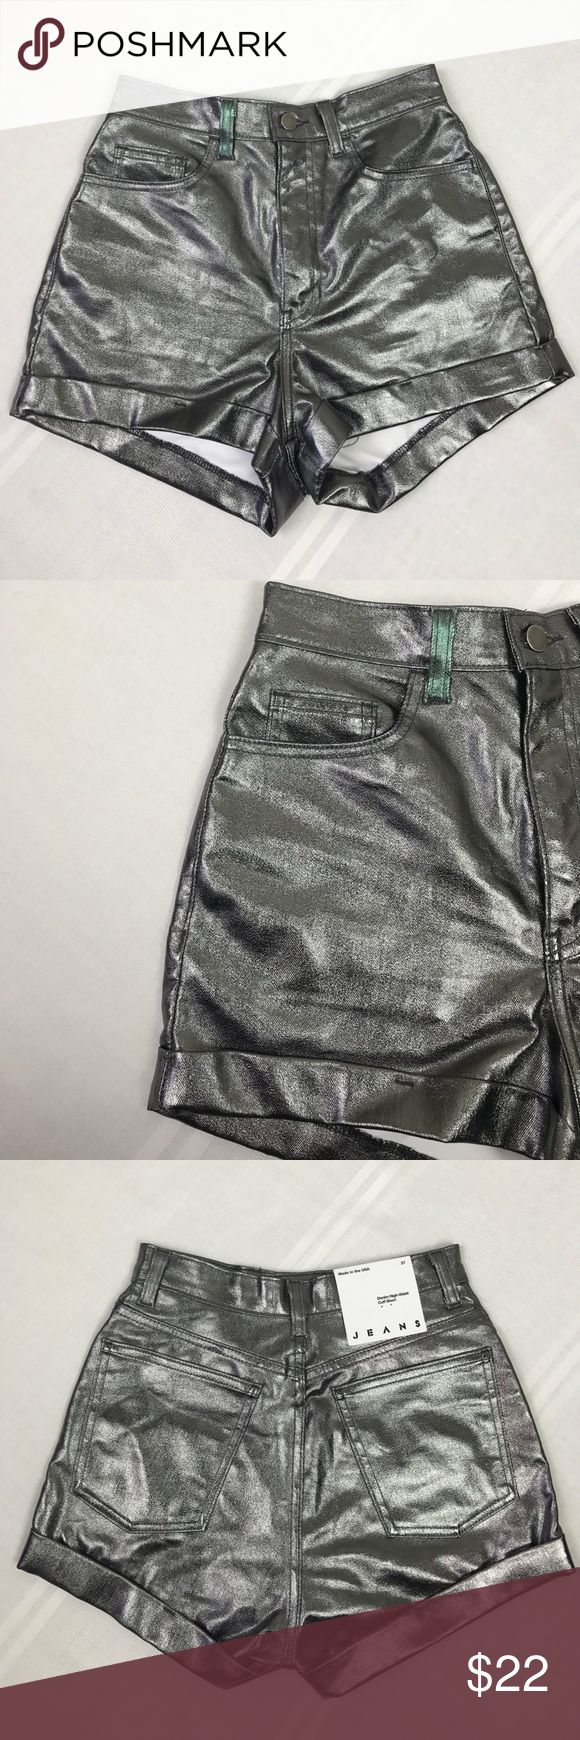 American Apparel Denim High Cuff Shorts Size 27 American Apparel Jeans Denim High-Waist Cuff Shorts Size 27 American Apparel Shorts Jean Shorts